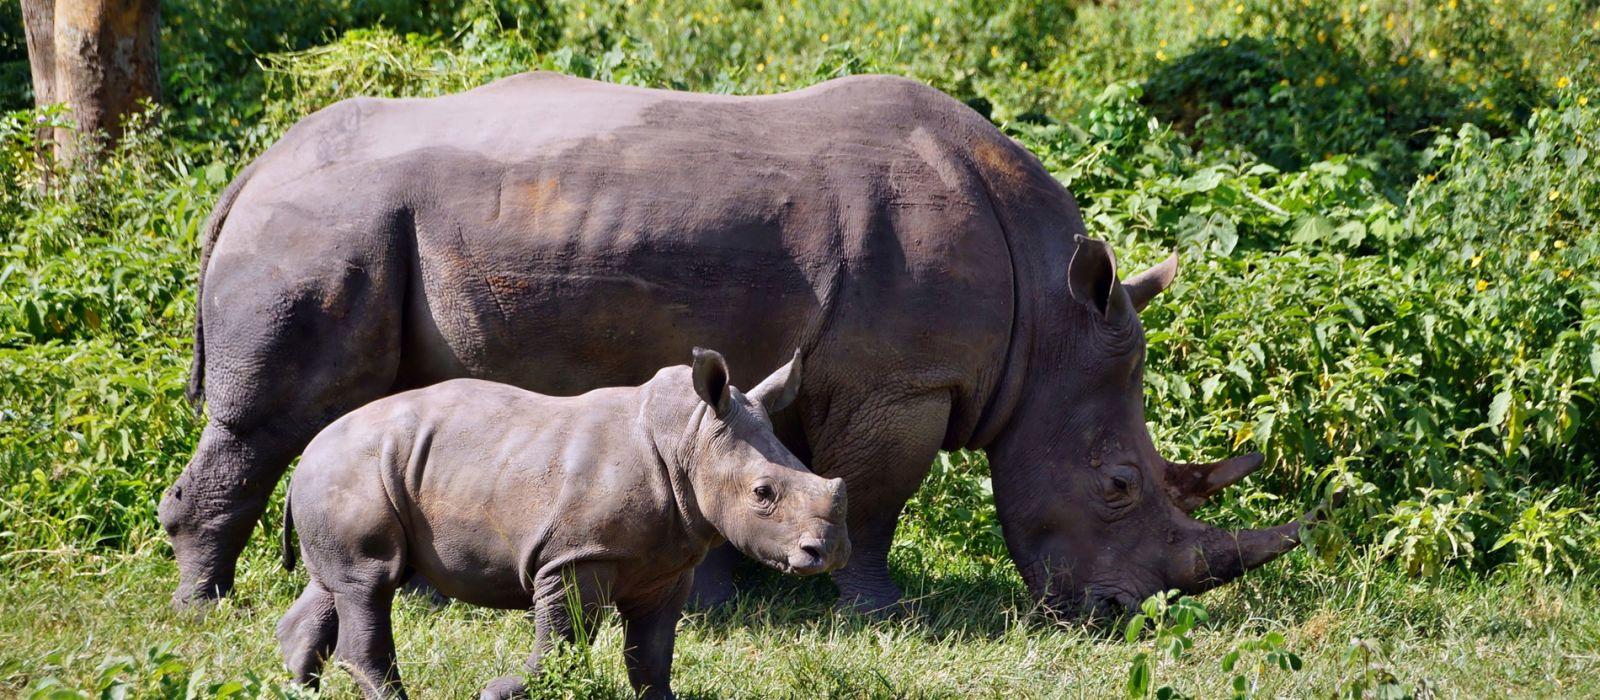 Destination Ziwa Rhino Sanctuary Uganda